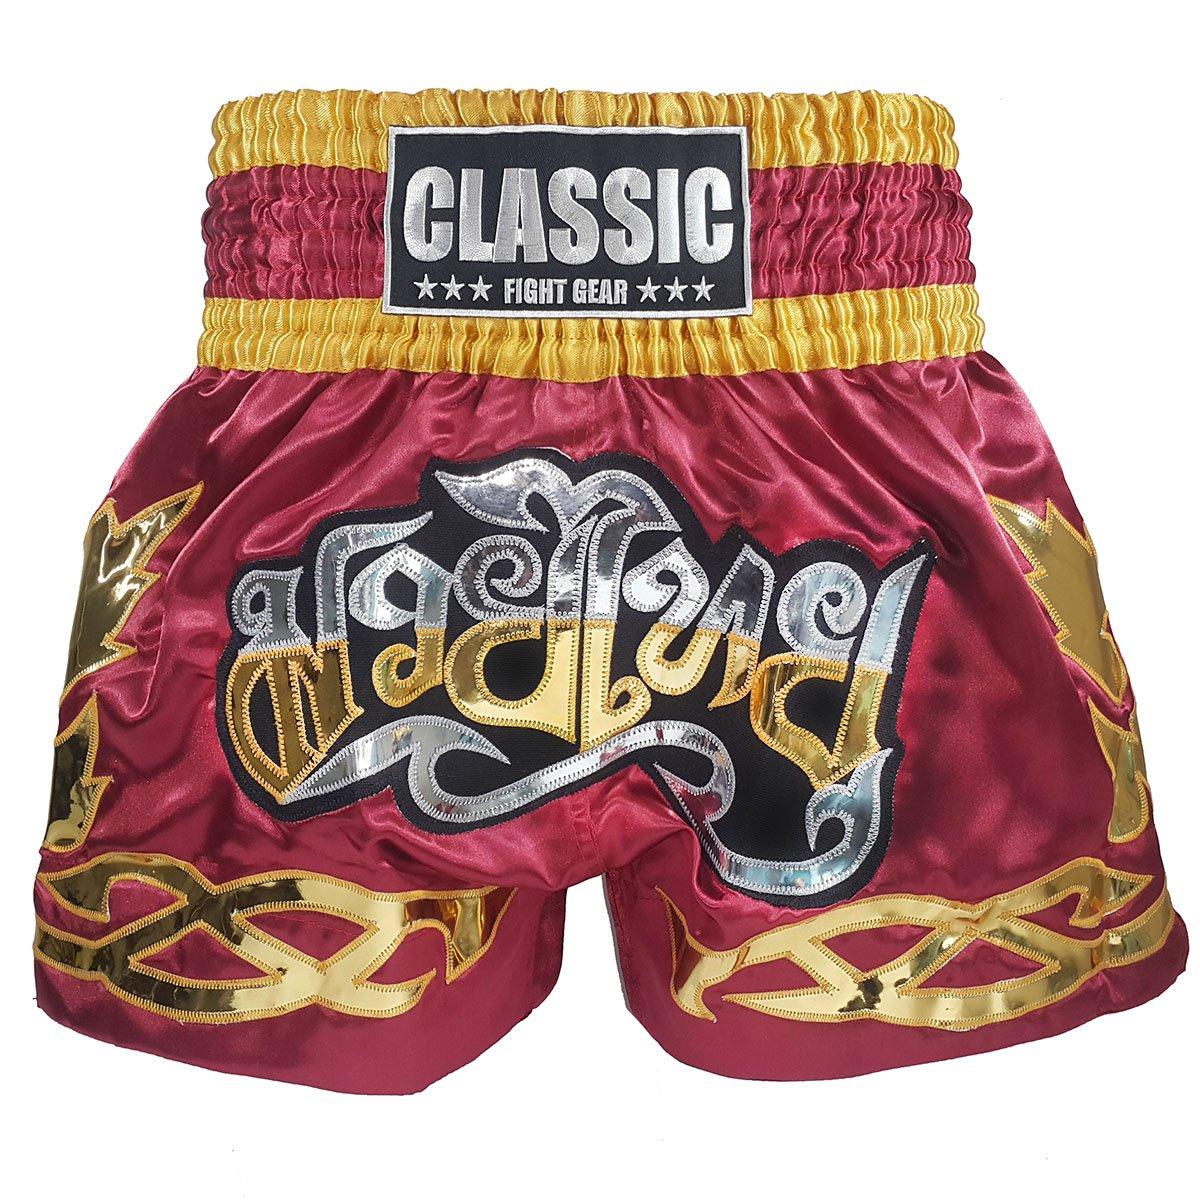 Thaishort Thaiboxhosen Classic Muay Thai Box Hose CLS-002